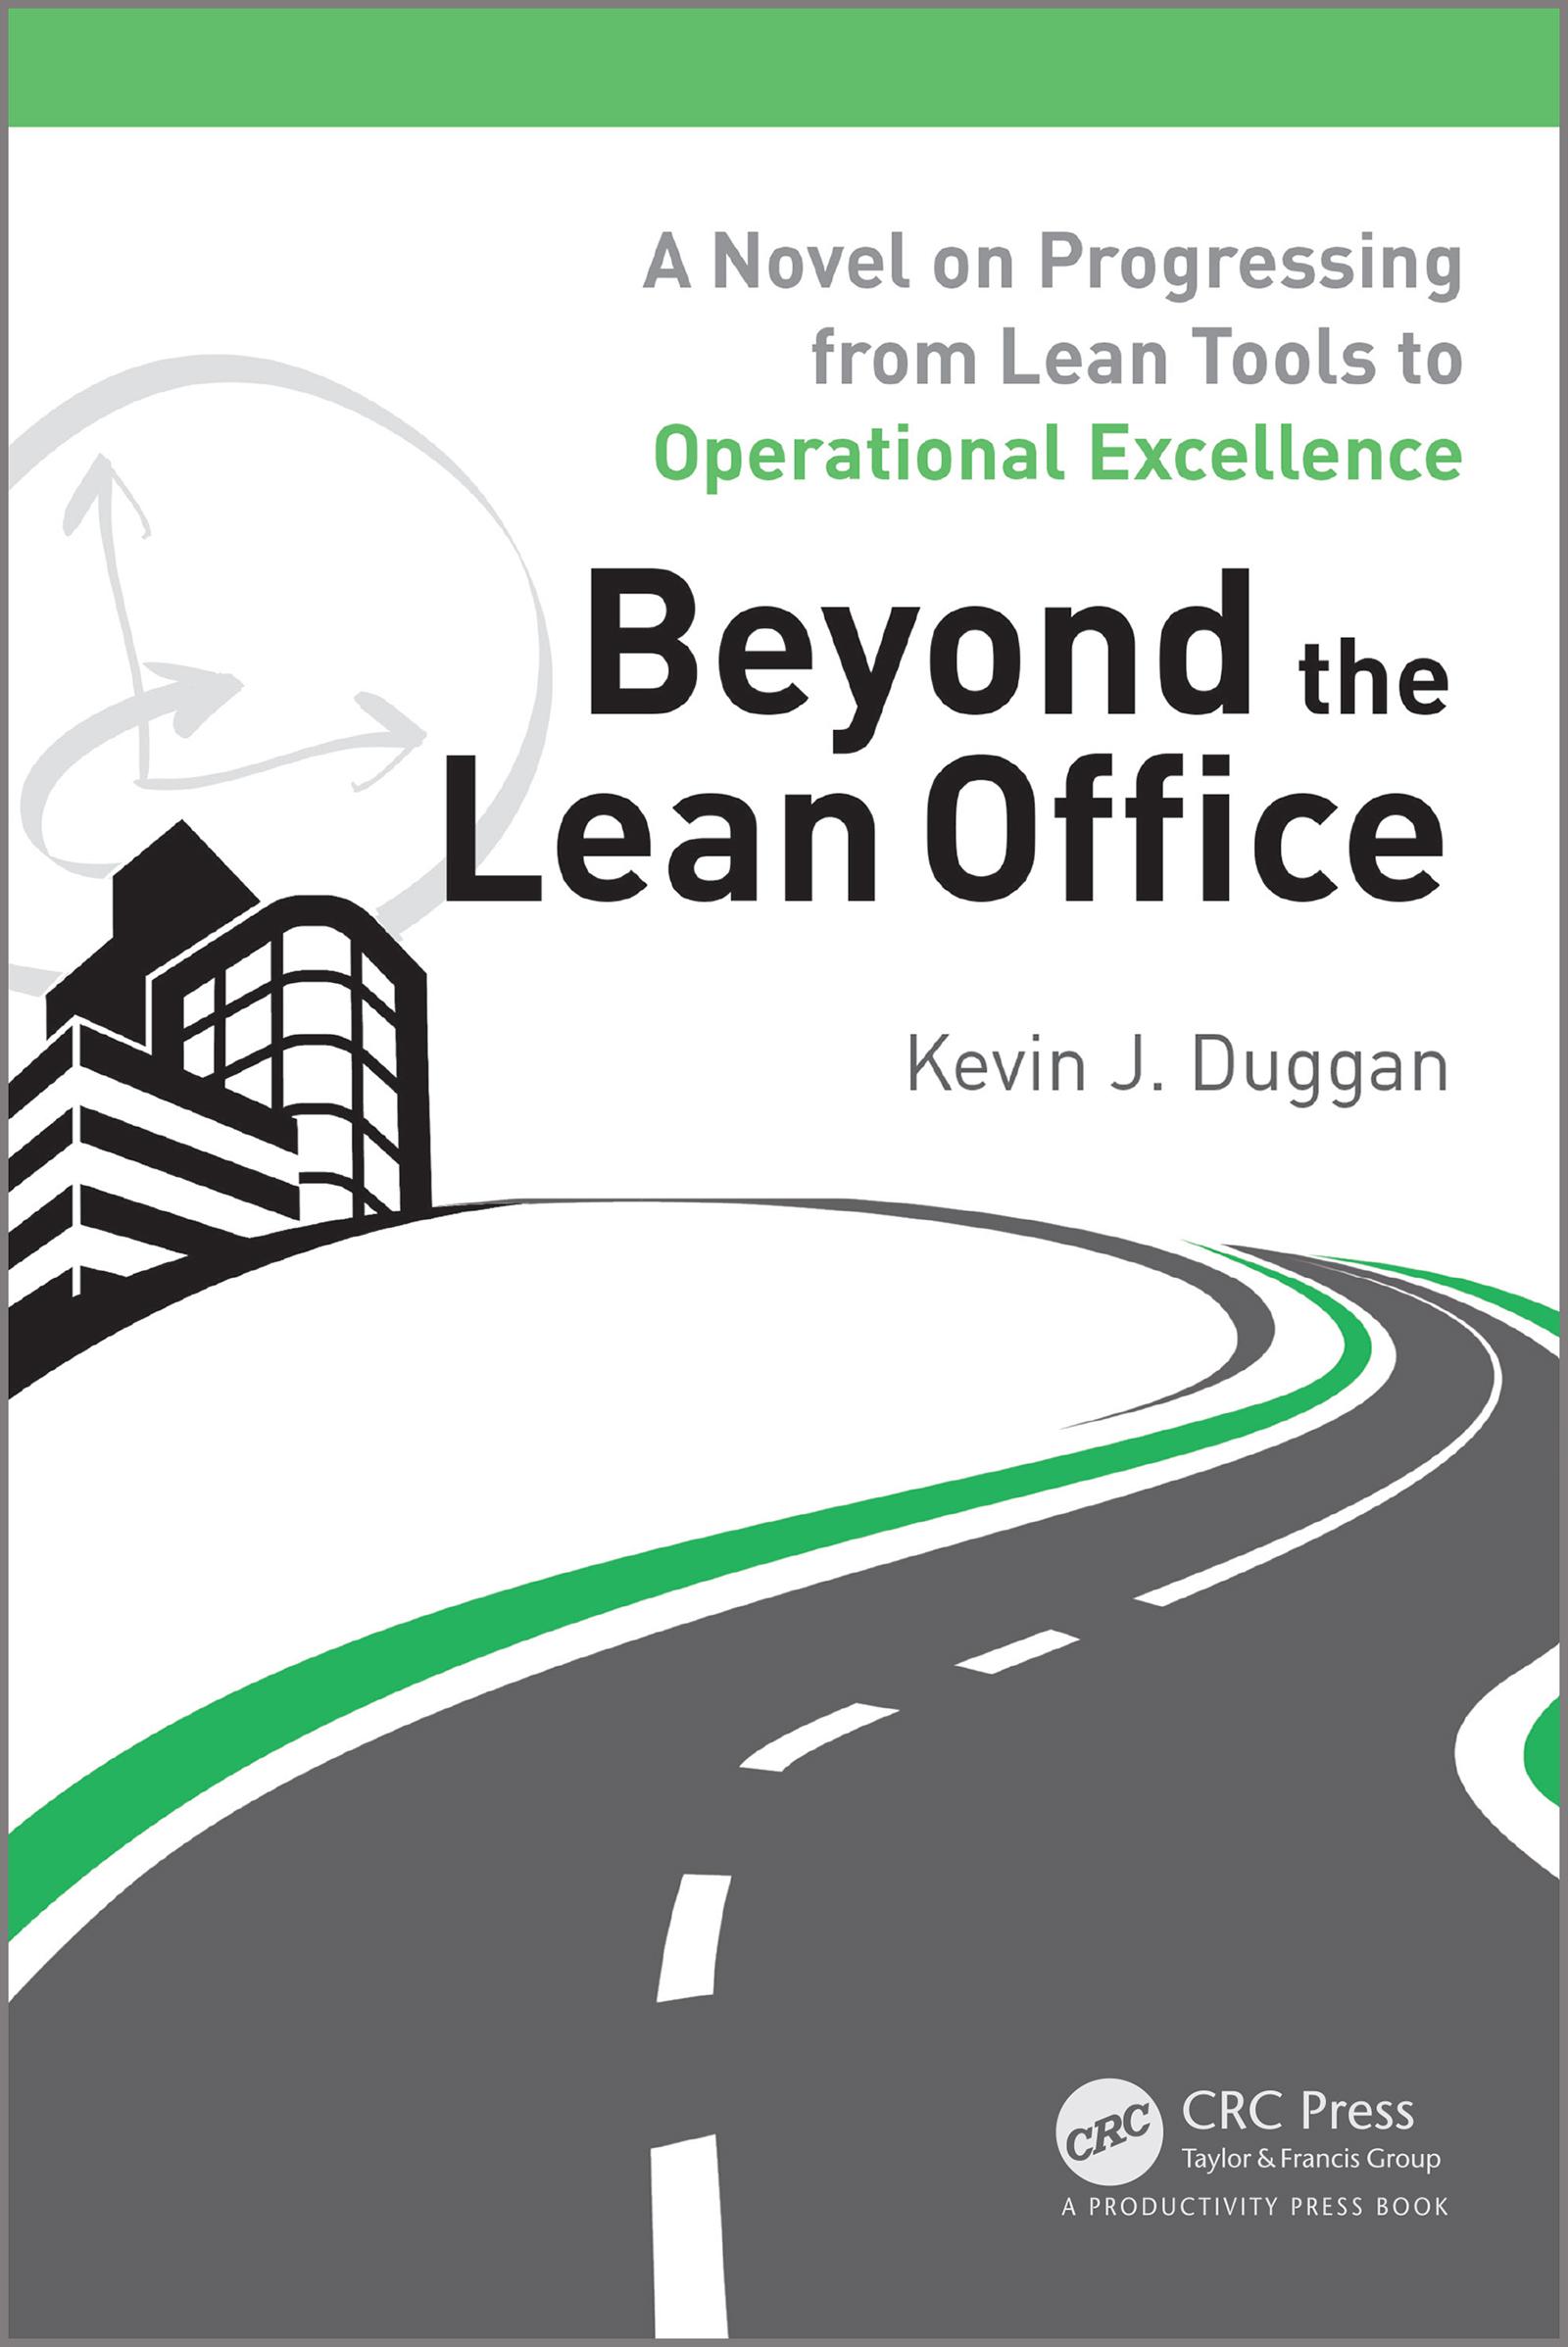 Download Ebook Beyond the Lean Office by Kevin J. Duggan Pdf